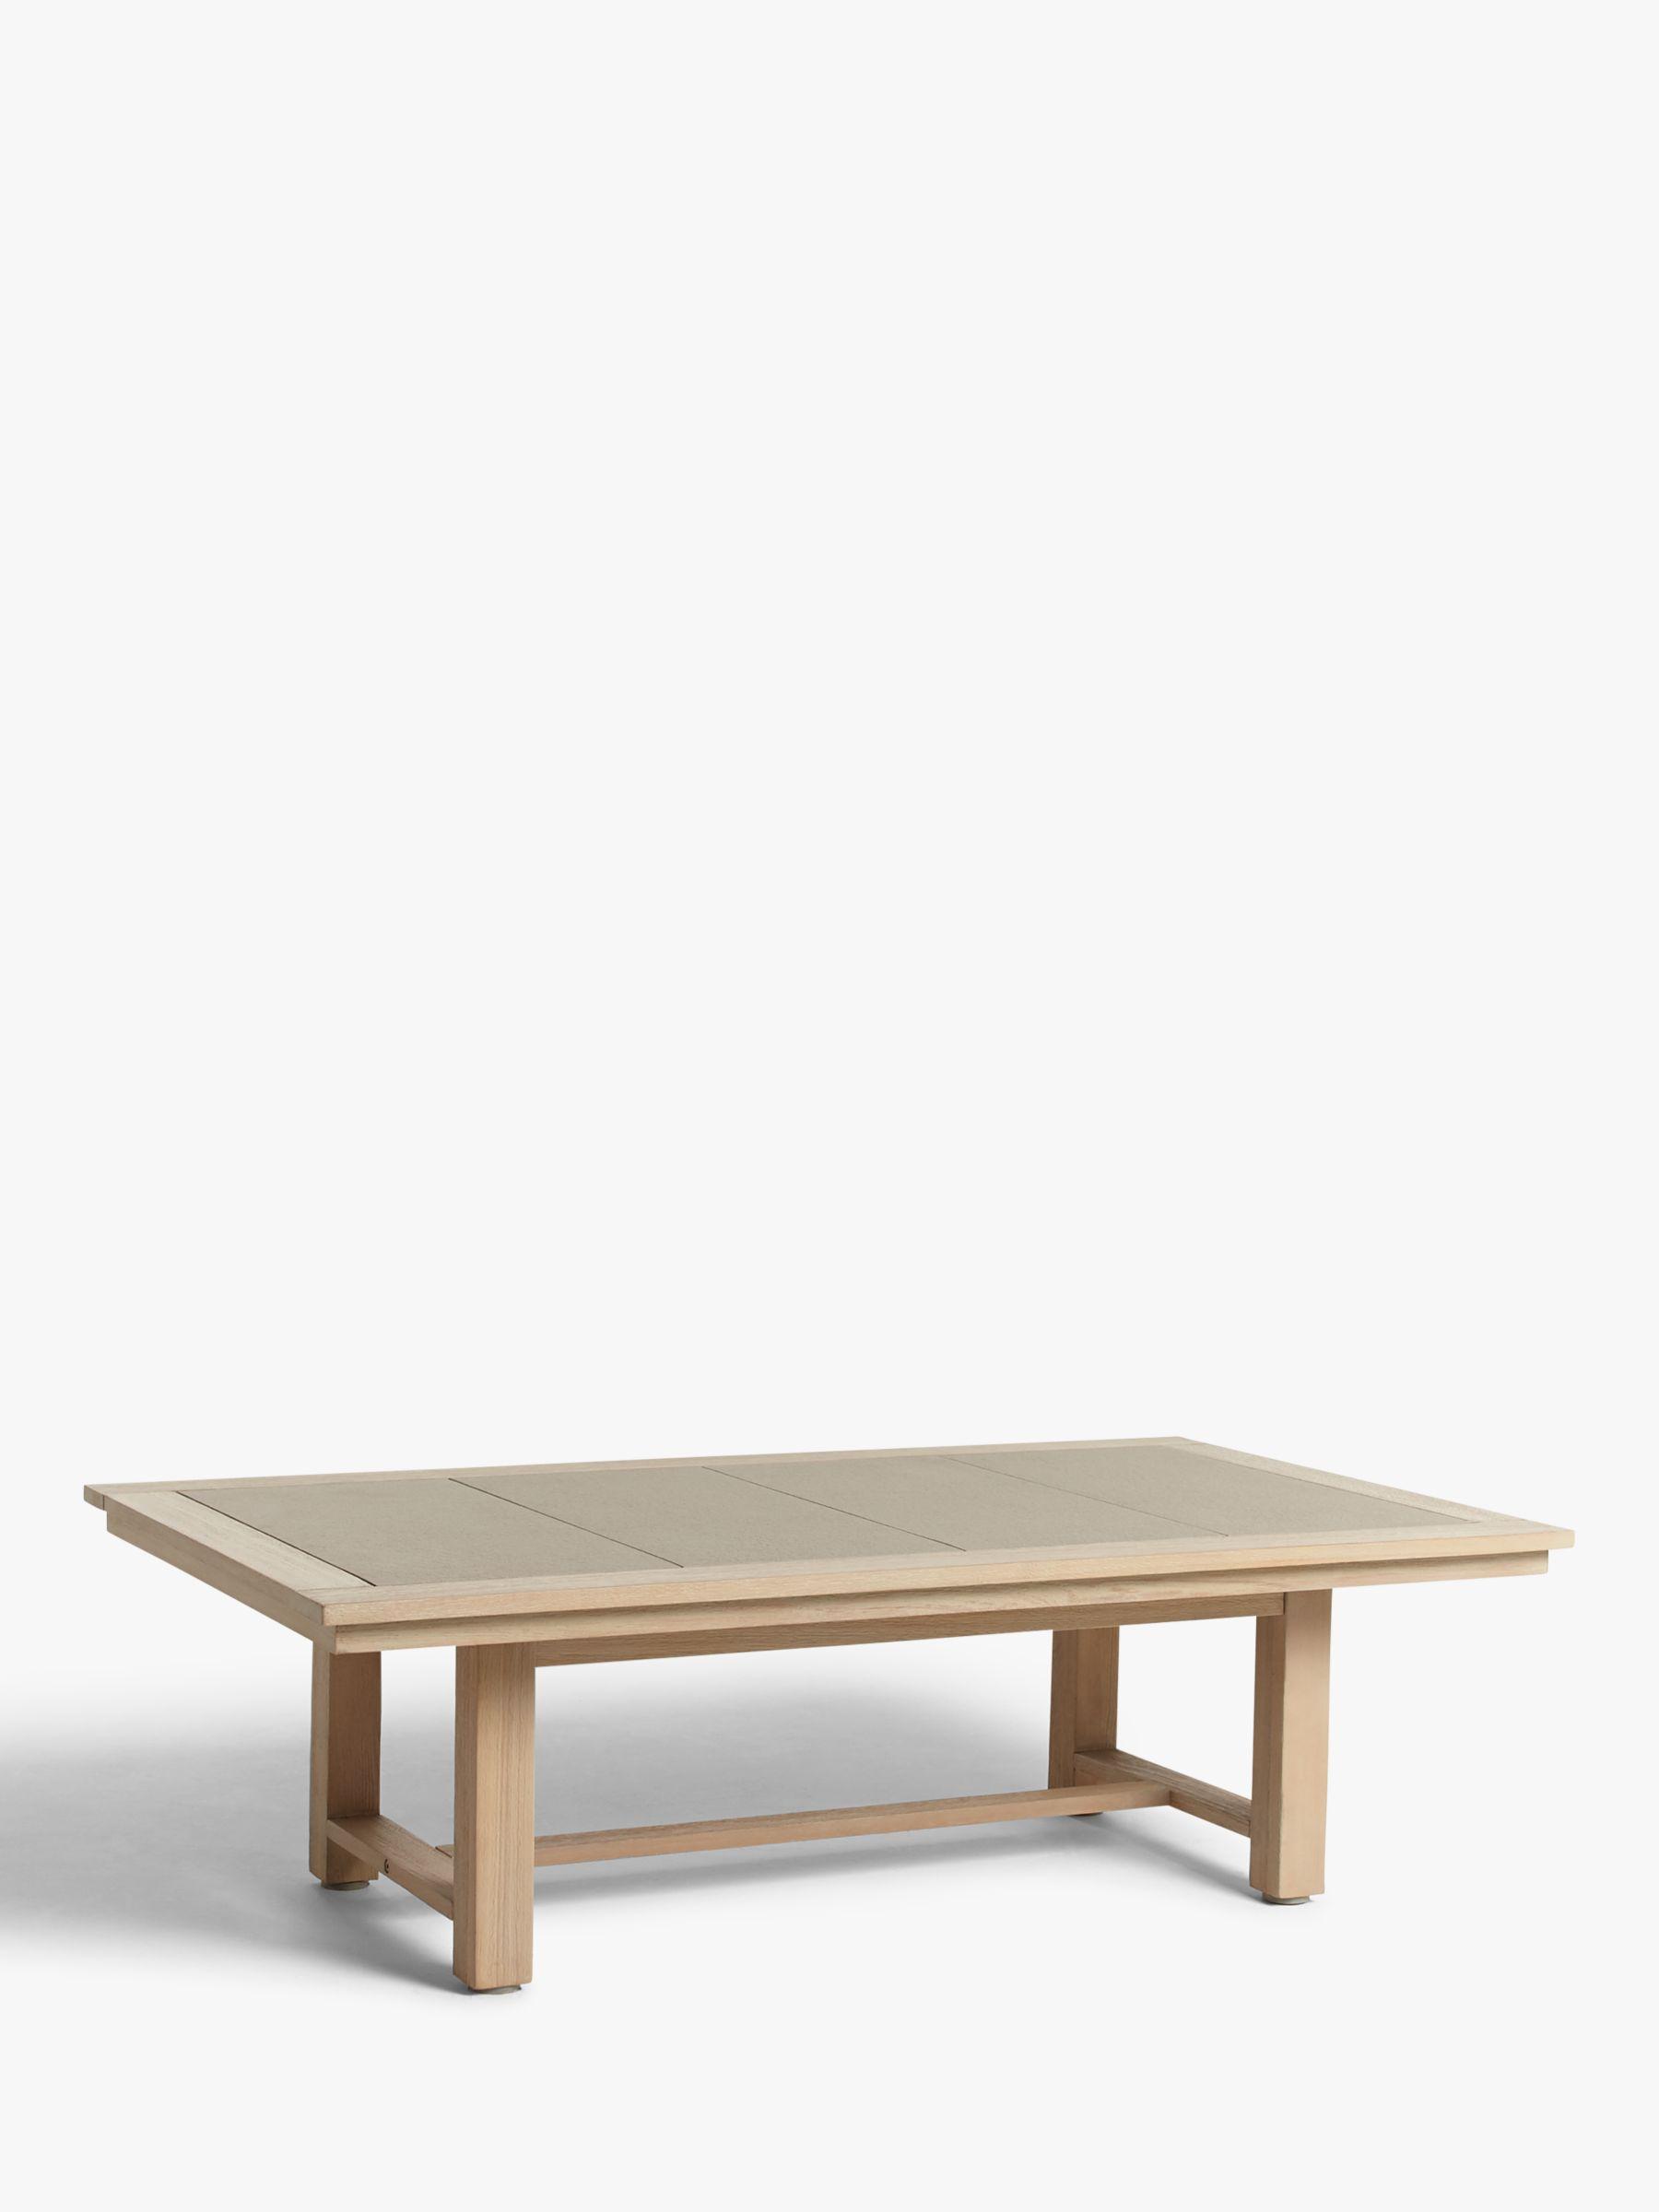 John Lewis & Partners St Ives Garden Coffee Table, FSC-Certified (Eucalyptus Wood), Natural